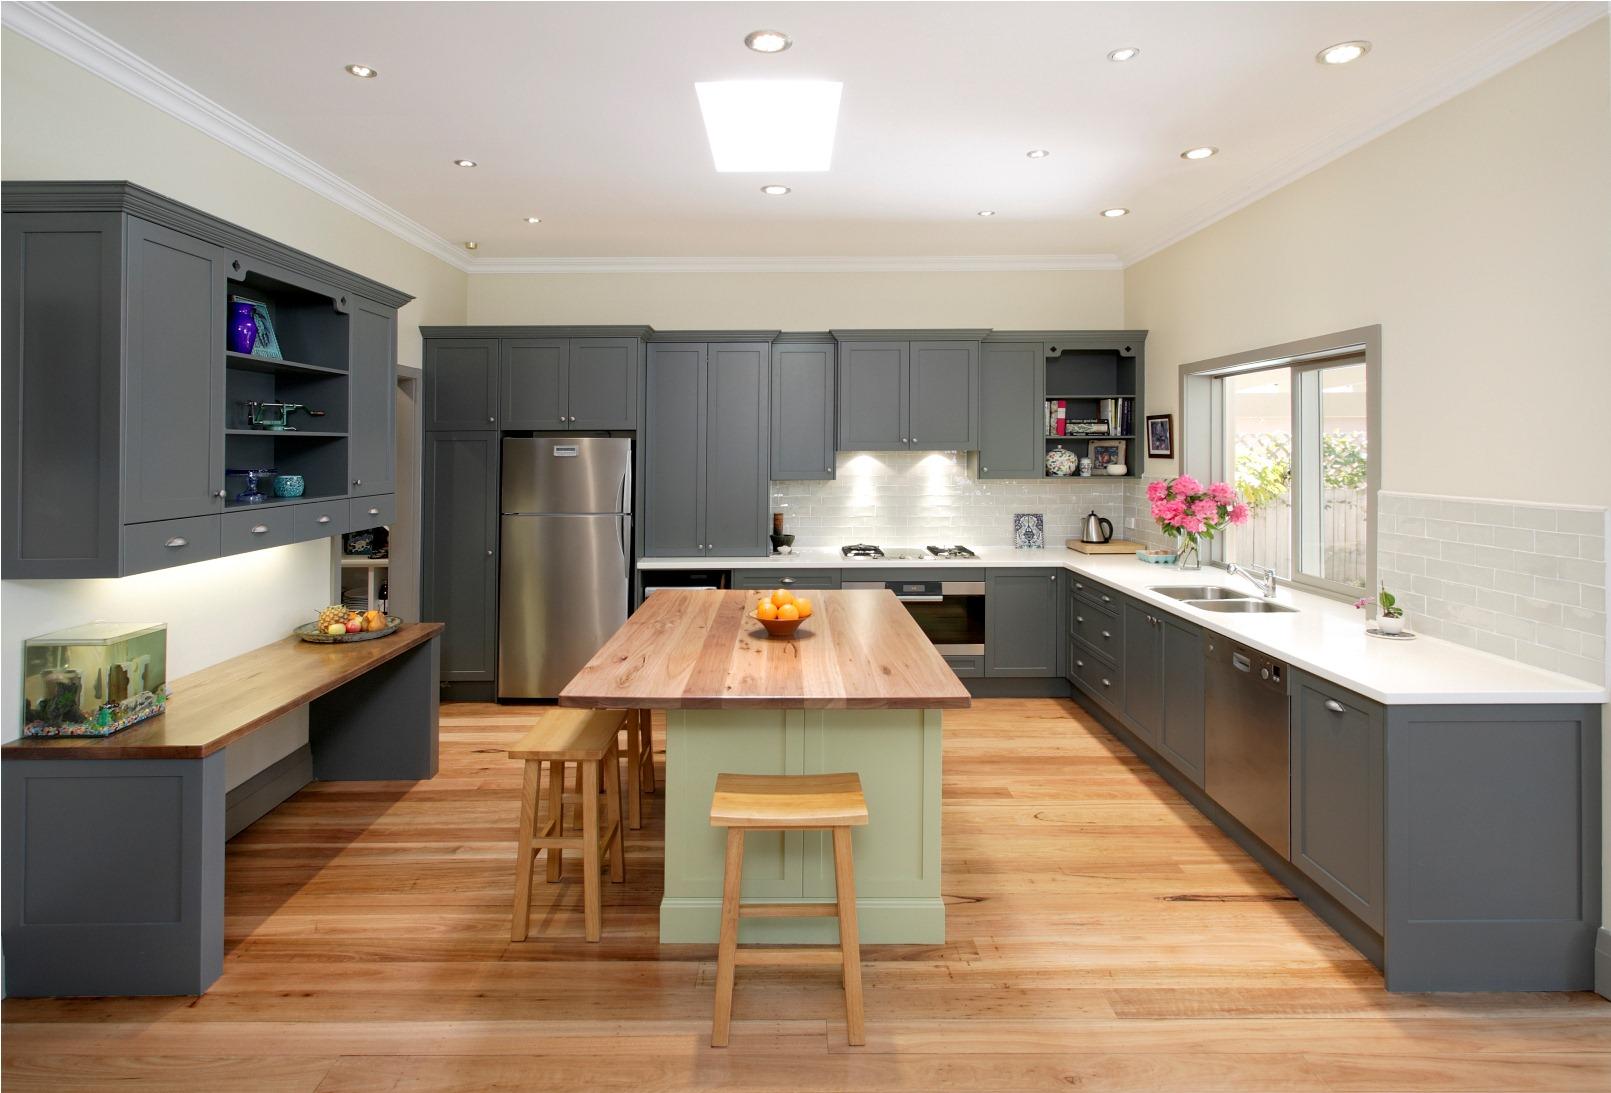 Дизайн кухни в картинках или фото